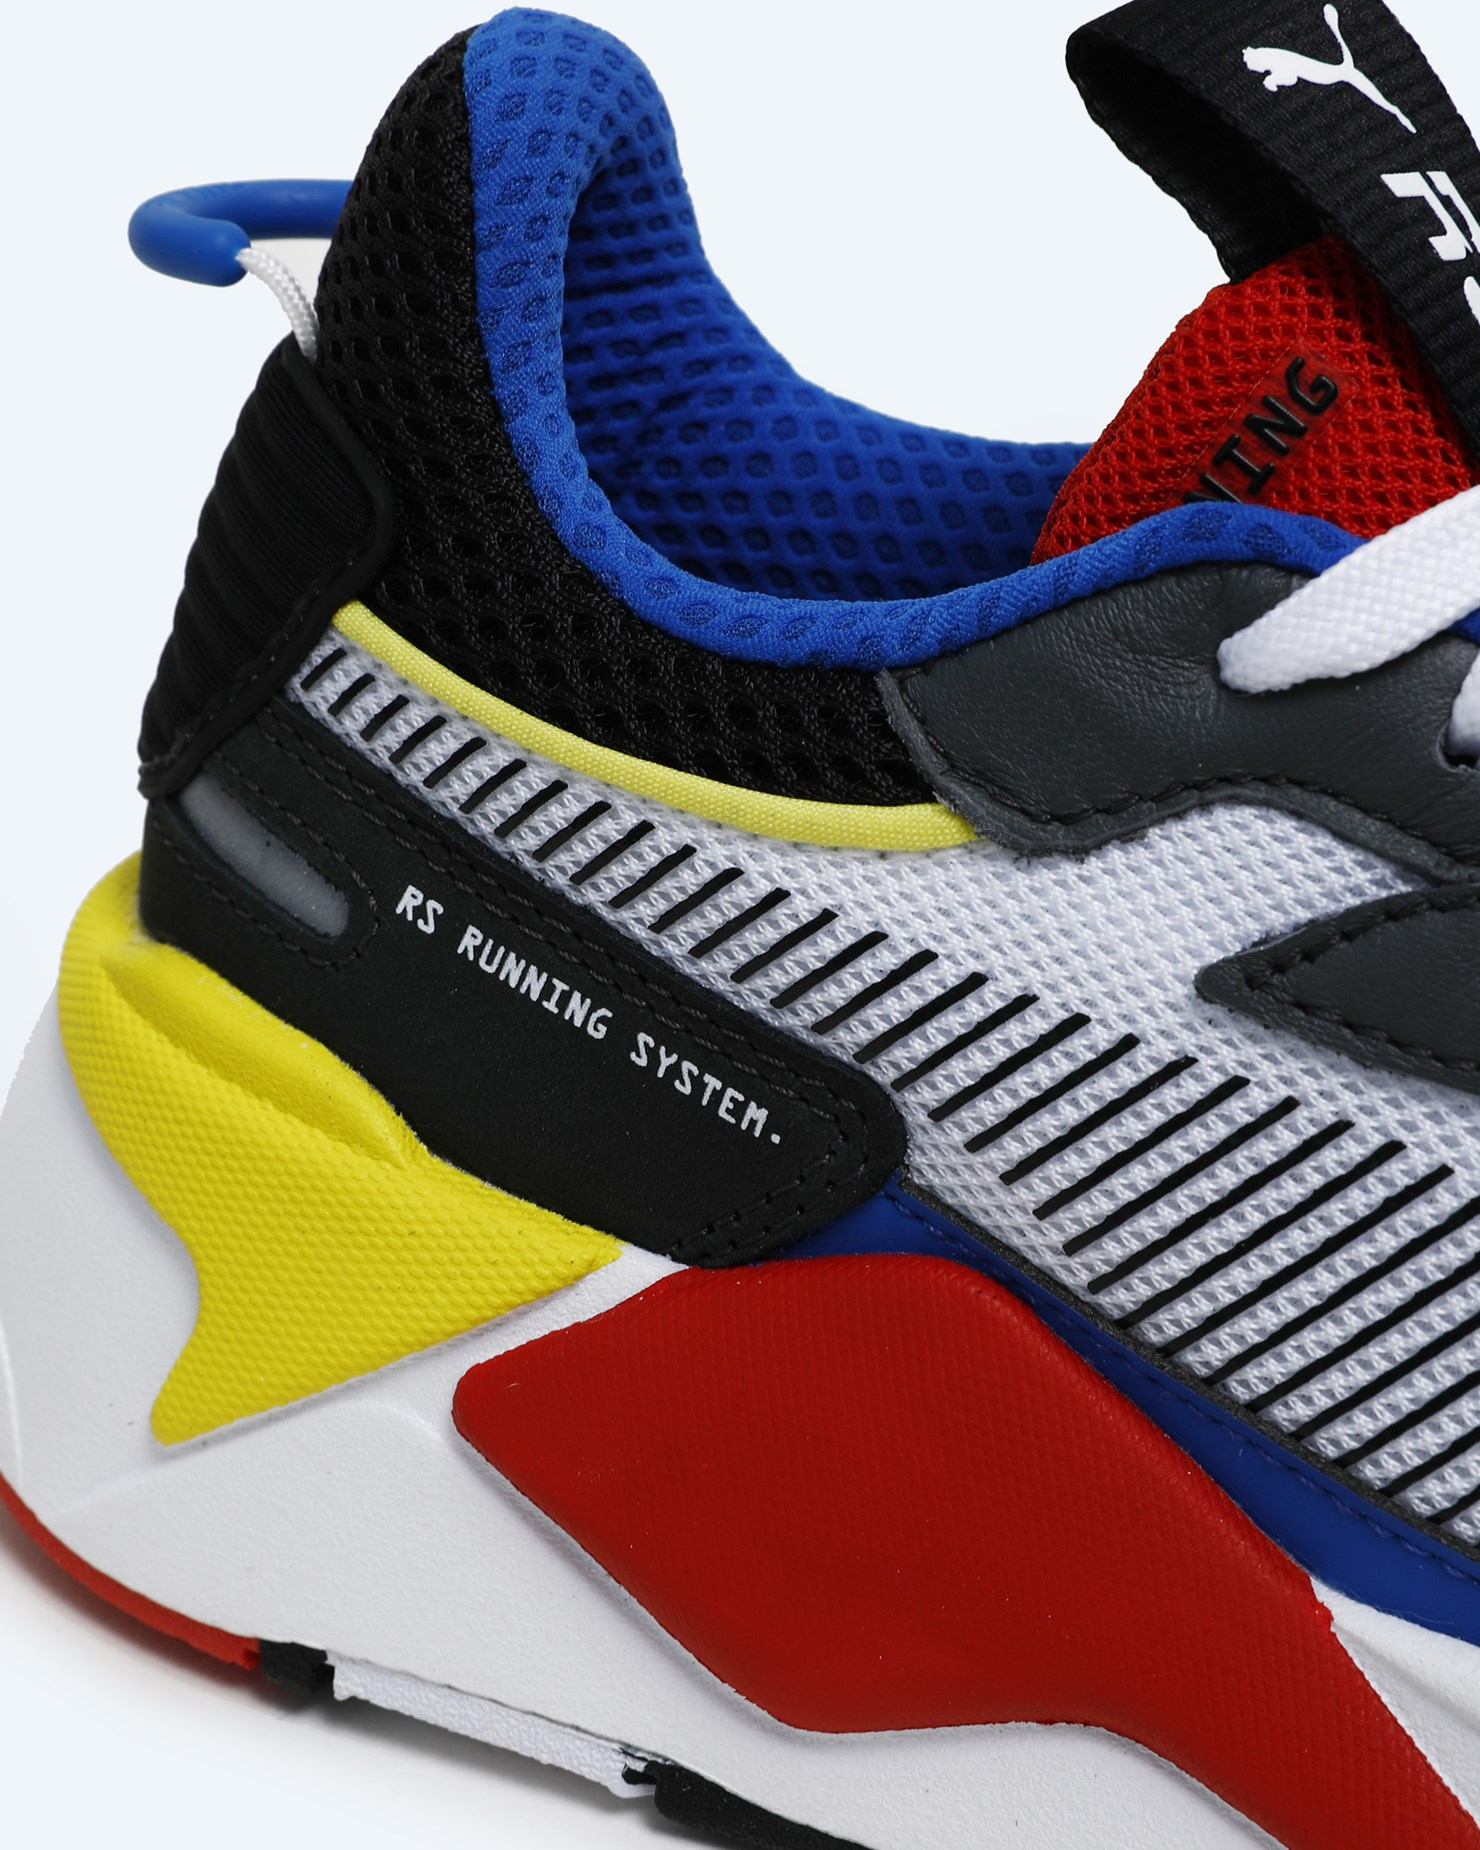 BIRKENSTOCK Shoes for kids | Kid shoes, Kids fashion